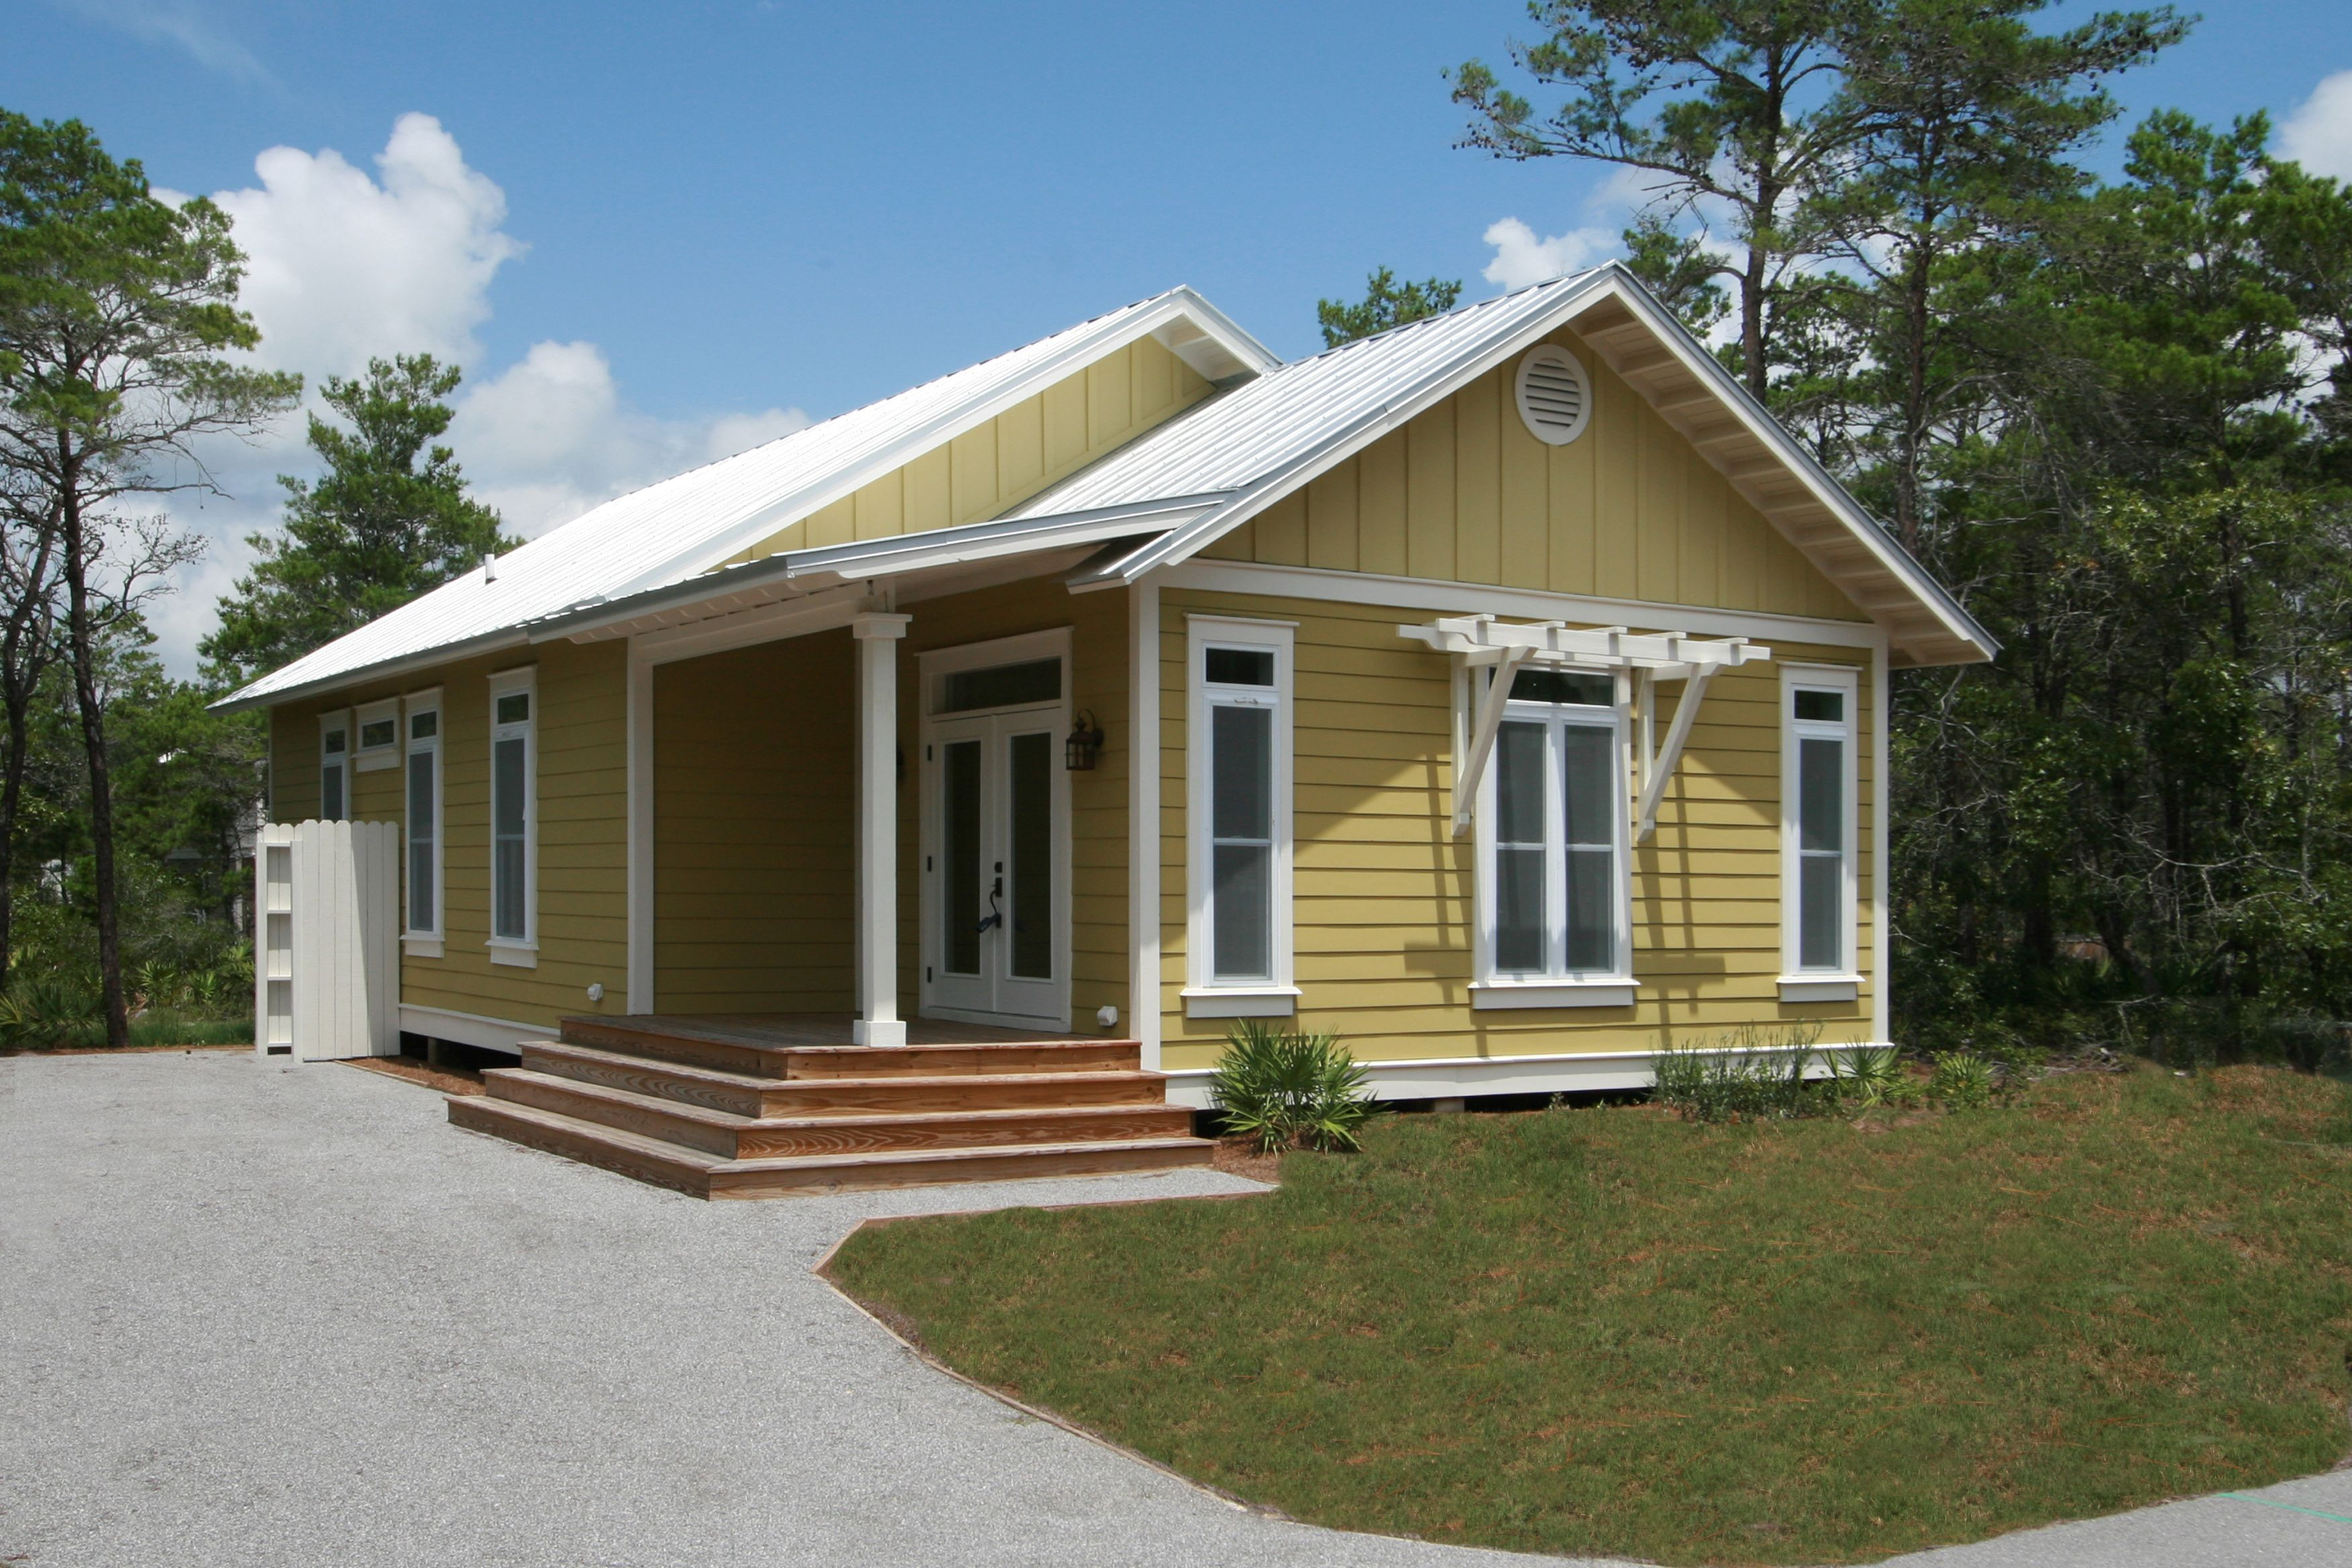 Custom Ranch Coastal Modular Home Design By Nationwide Homes Modular Home Designs Modular Homes Custom Homes